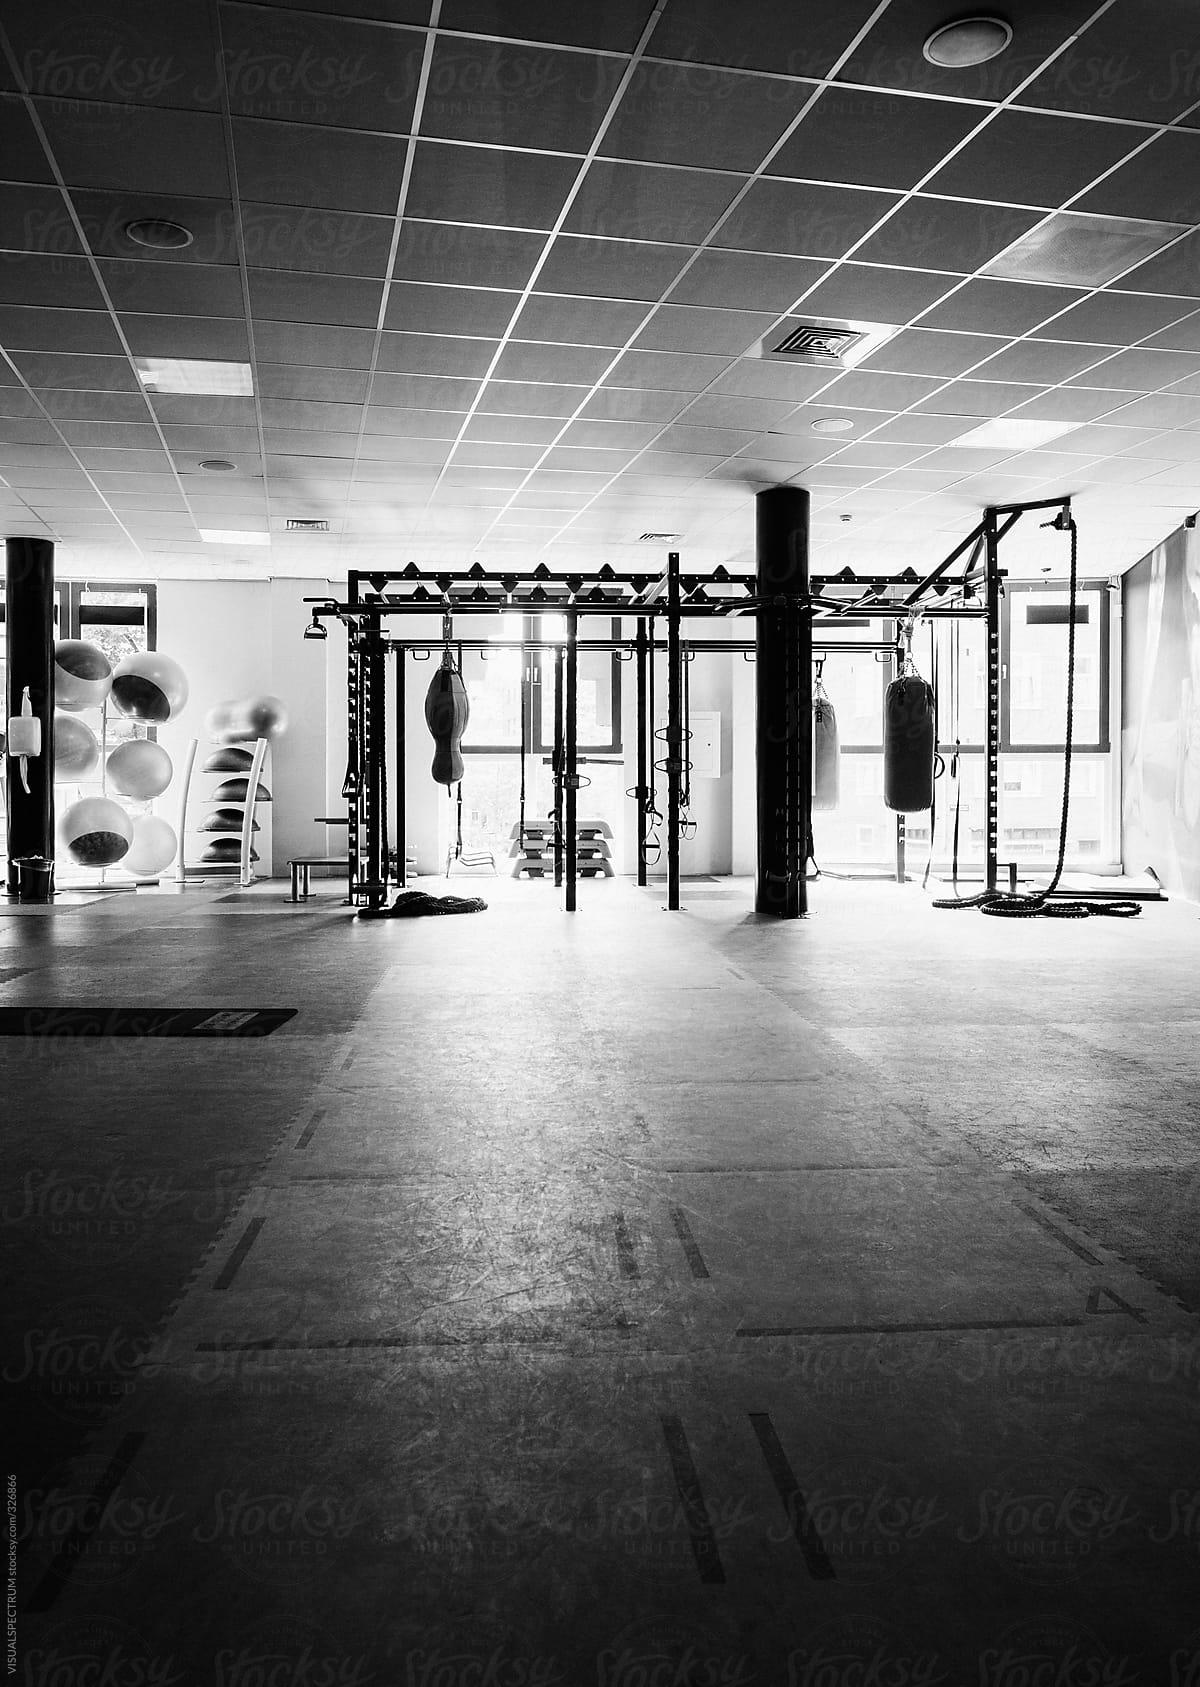 Modern gym room stocksy united